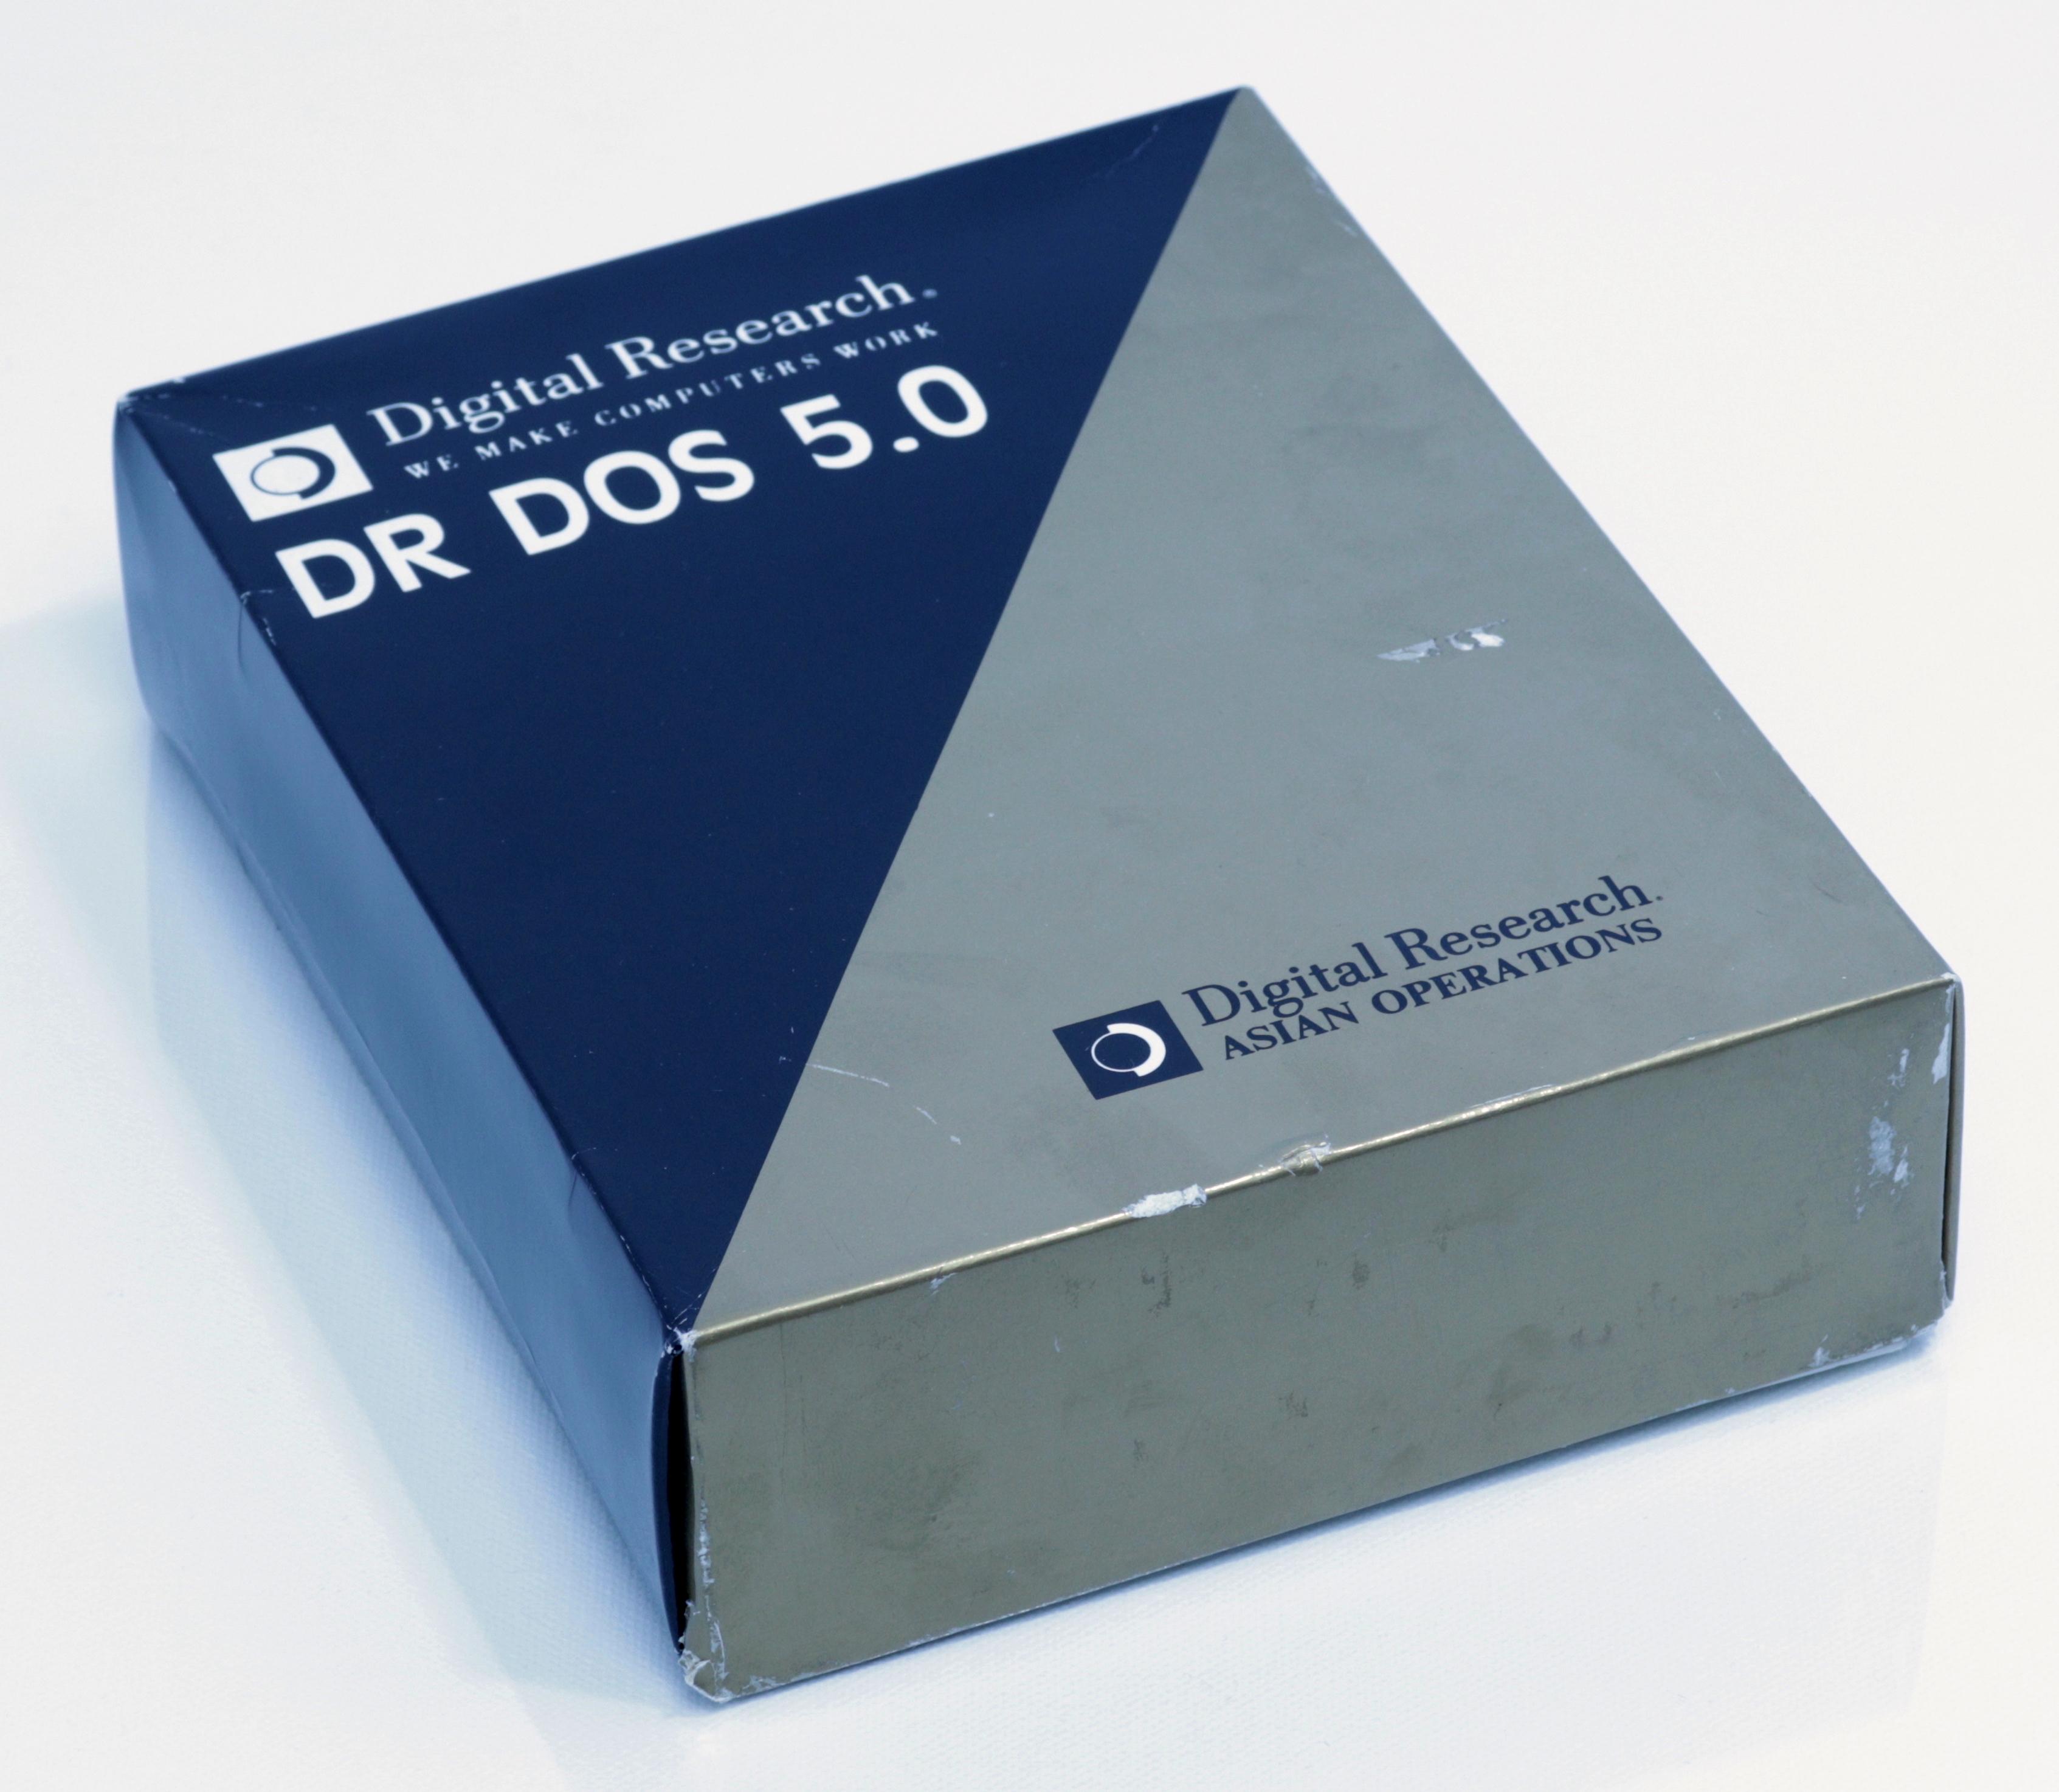 DR-DOS 5.0